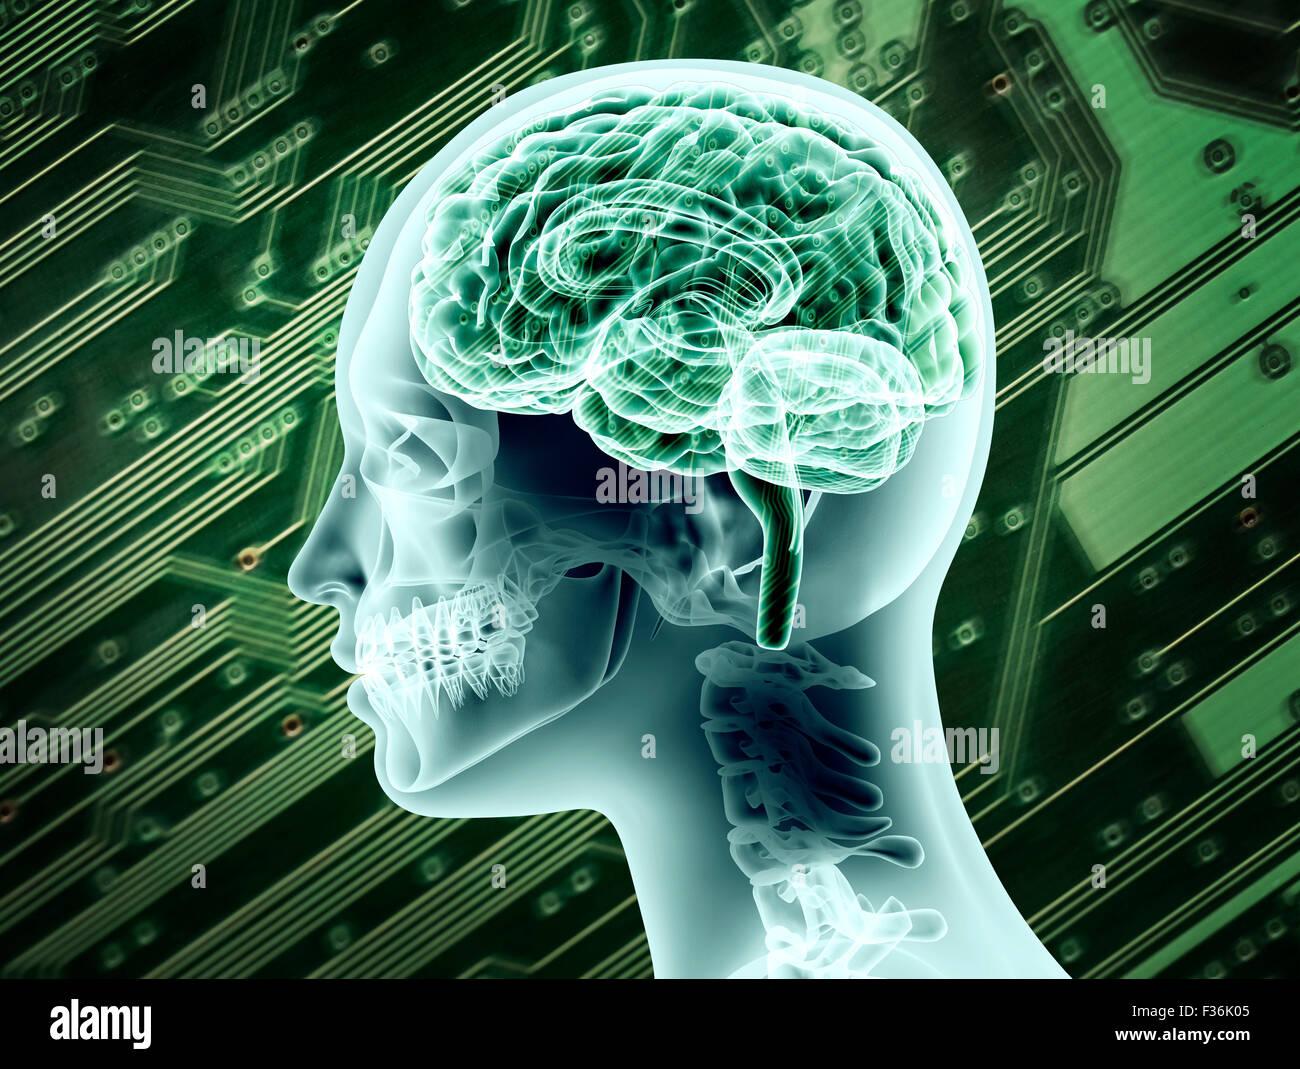 Illustrative representation of female brain anatomy. - Stock Image